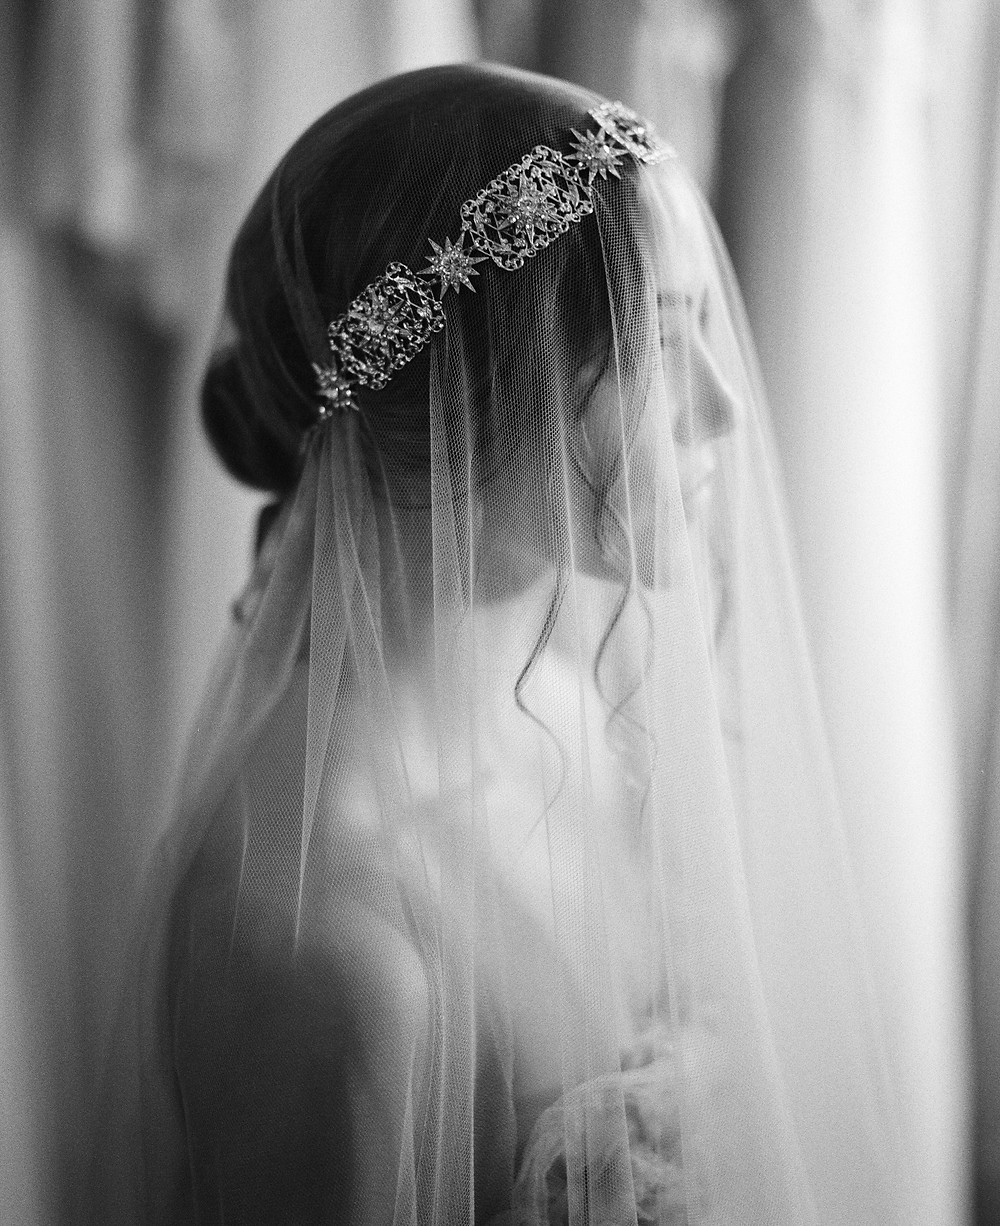 Lumiere Halo by Liv Hart / Photo by Sara Donaldson